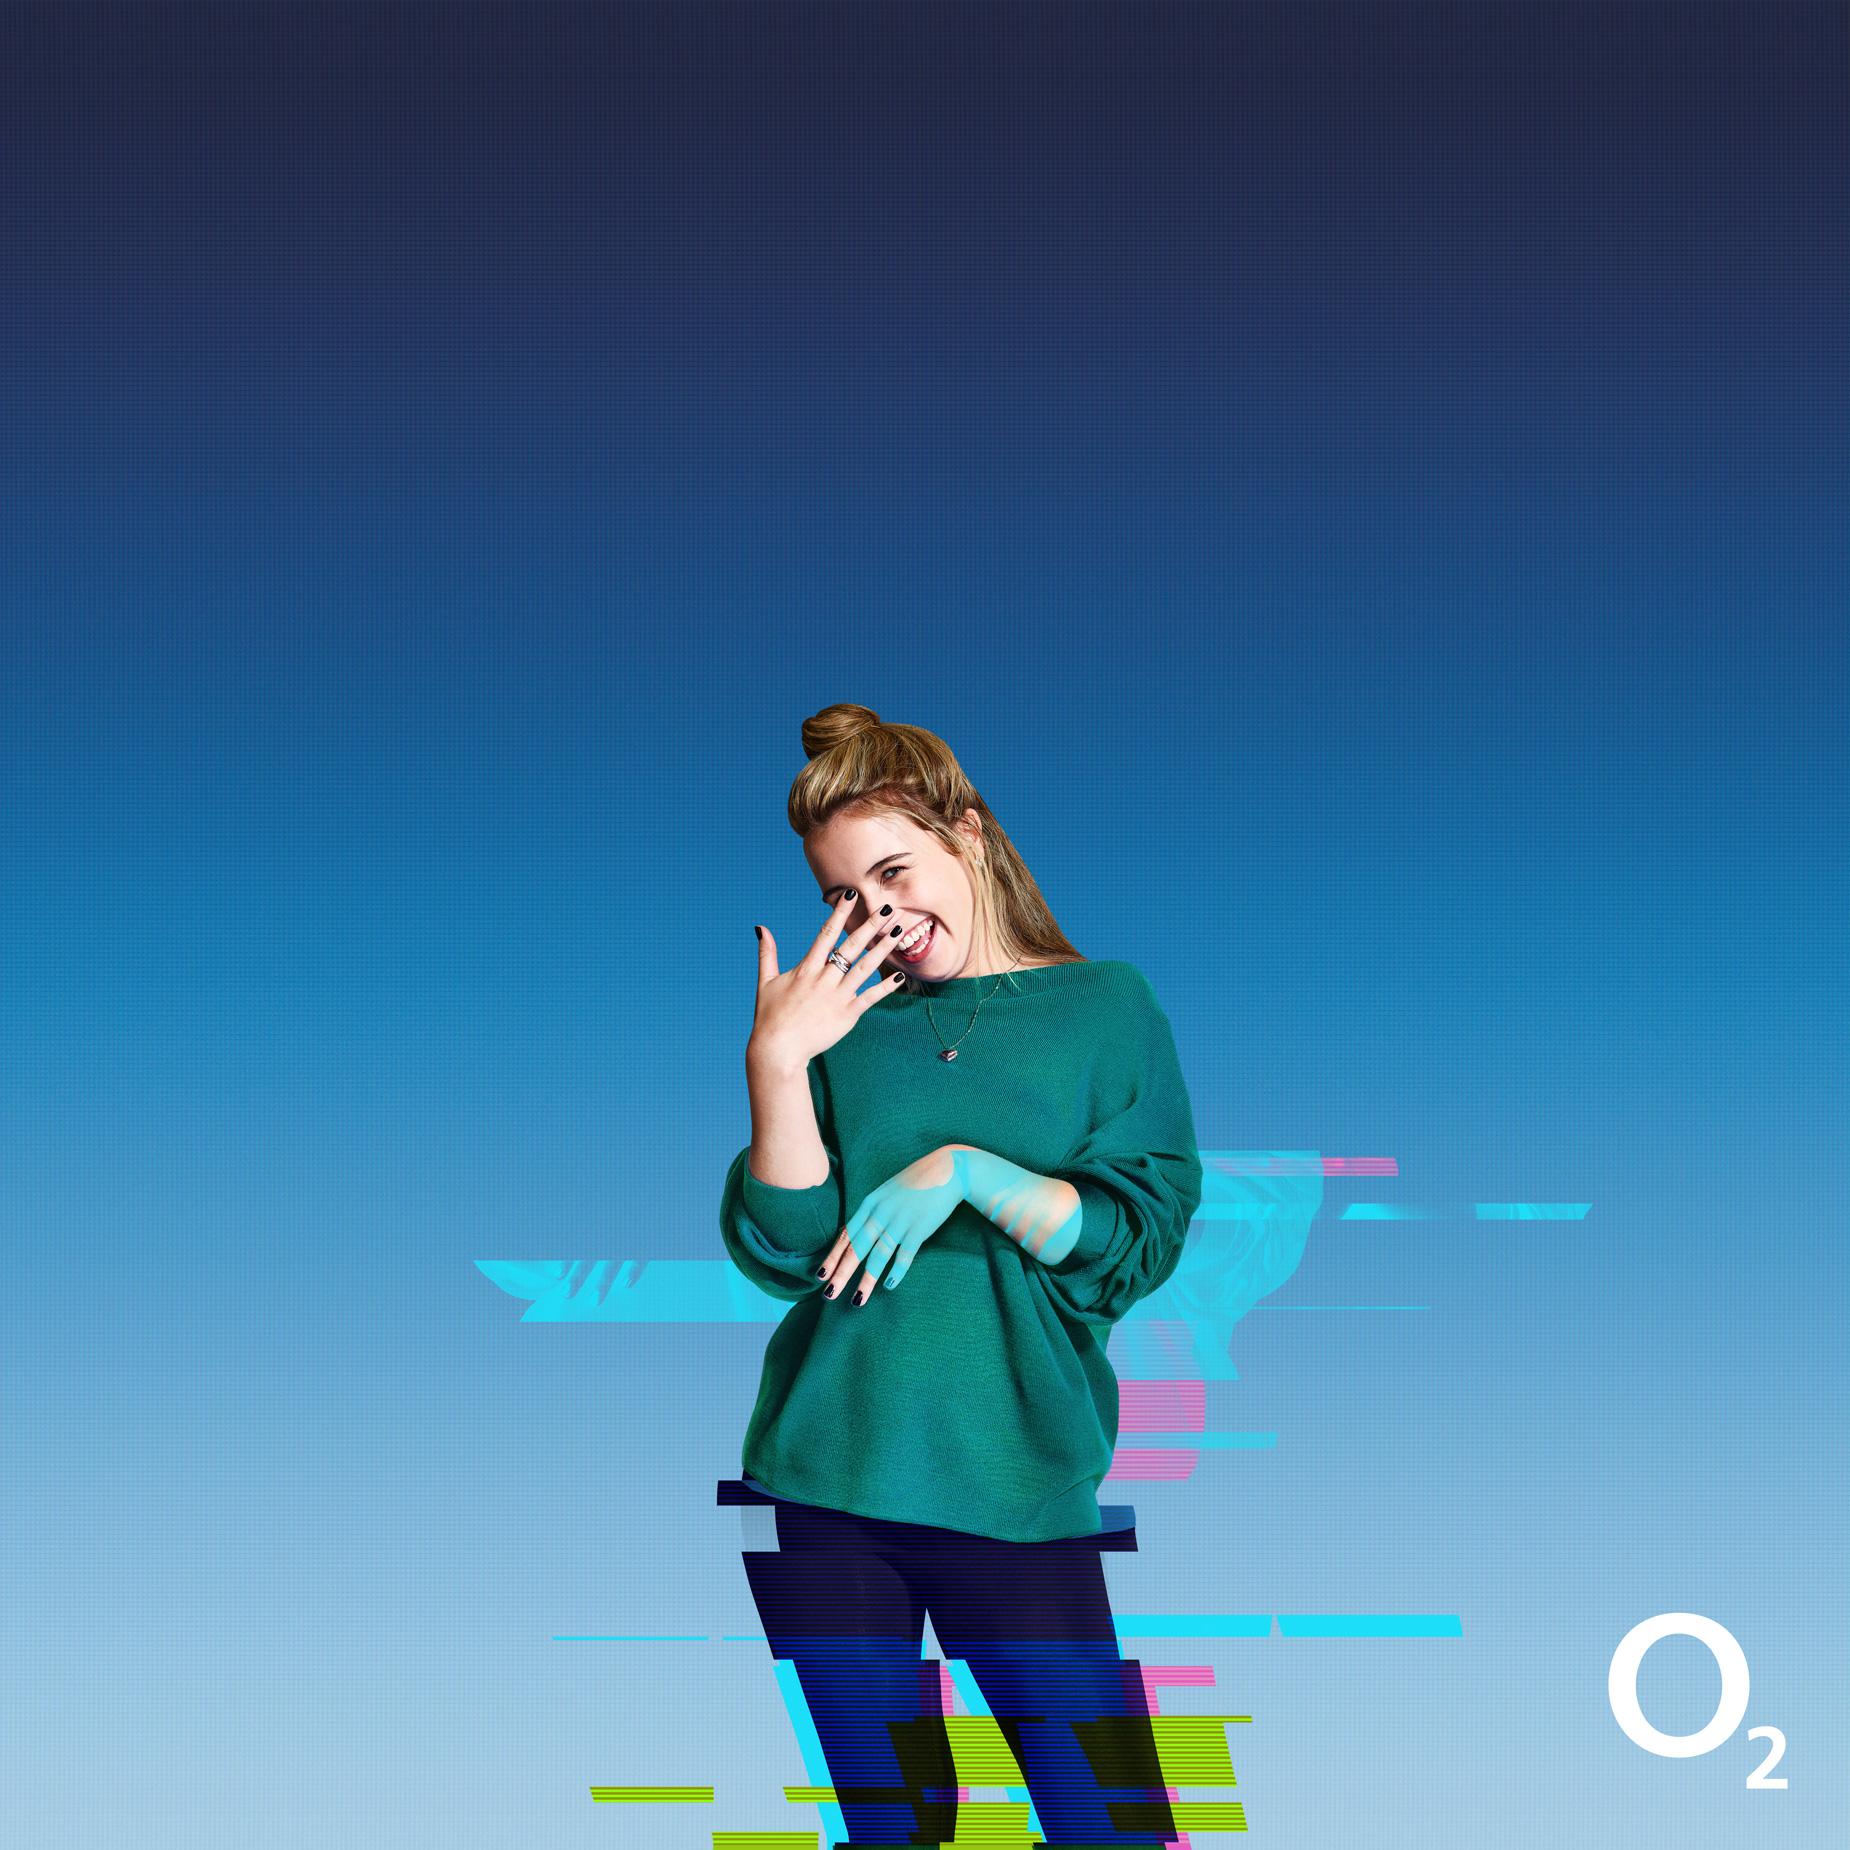 O2-Go-Think-Big-Chloe-Hine-2-Small-RGB